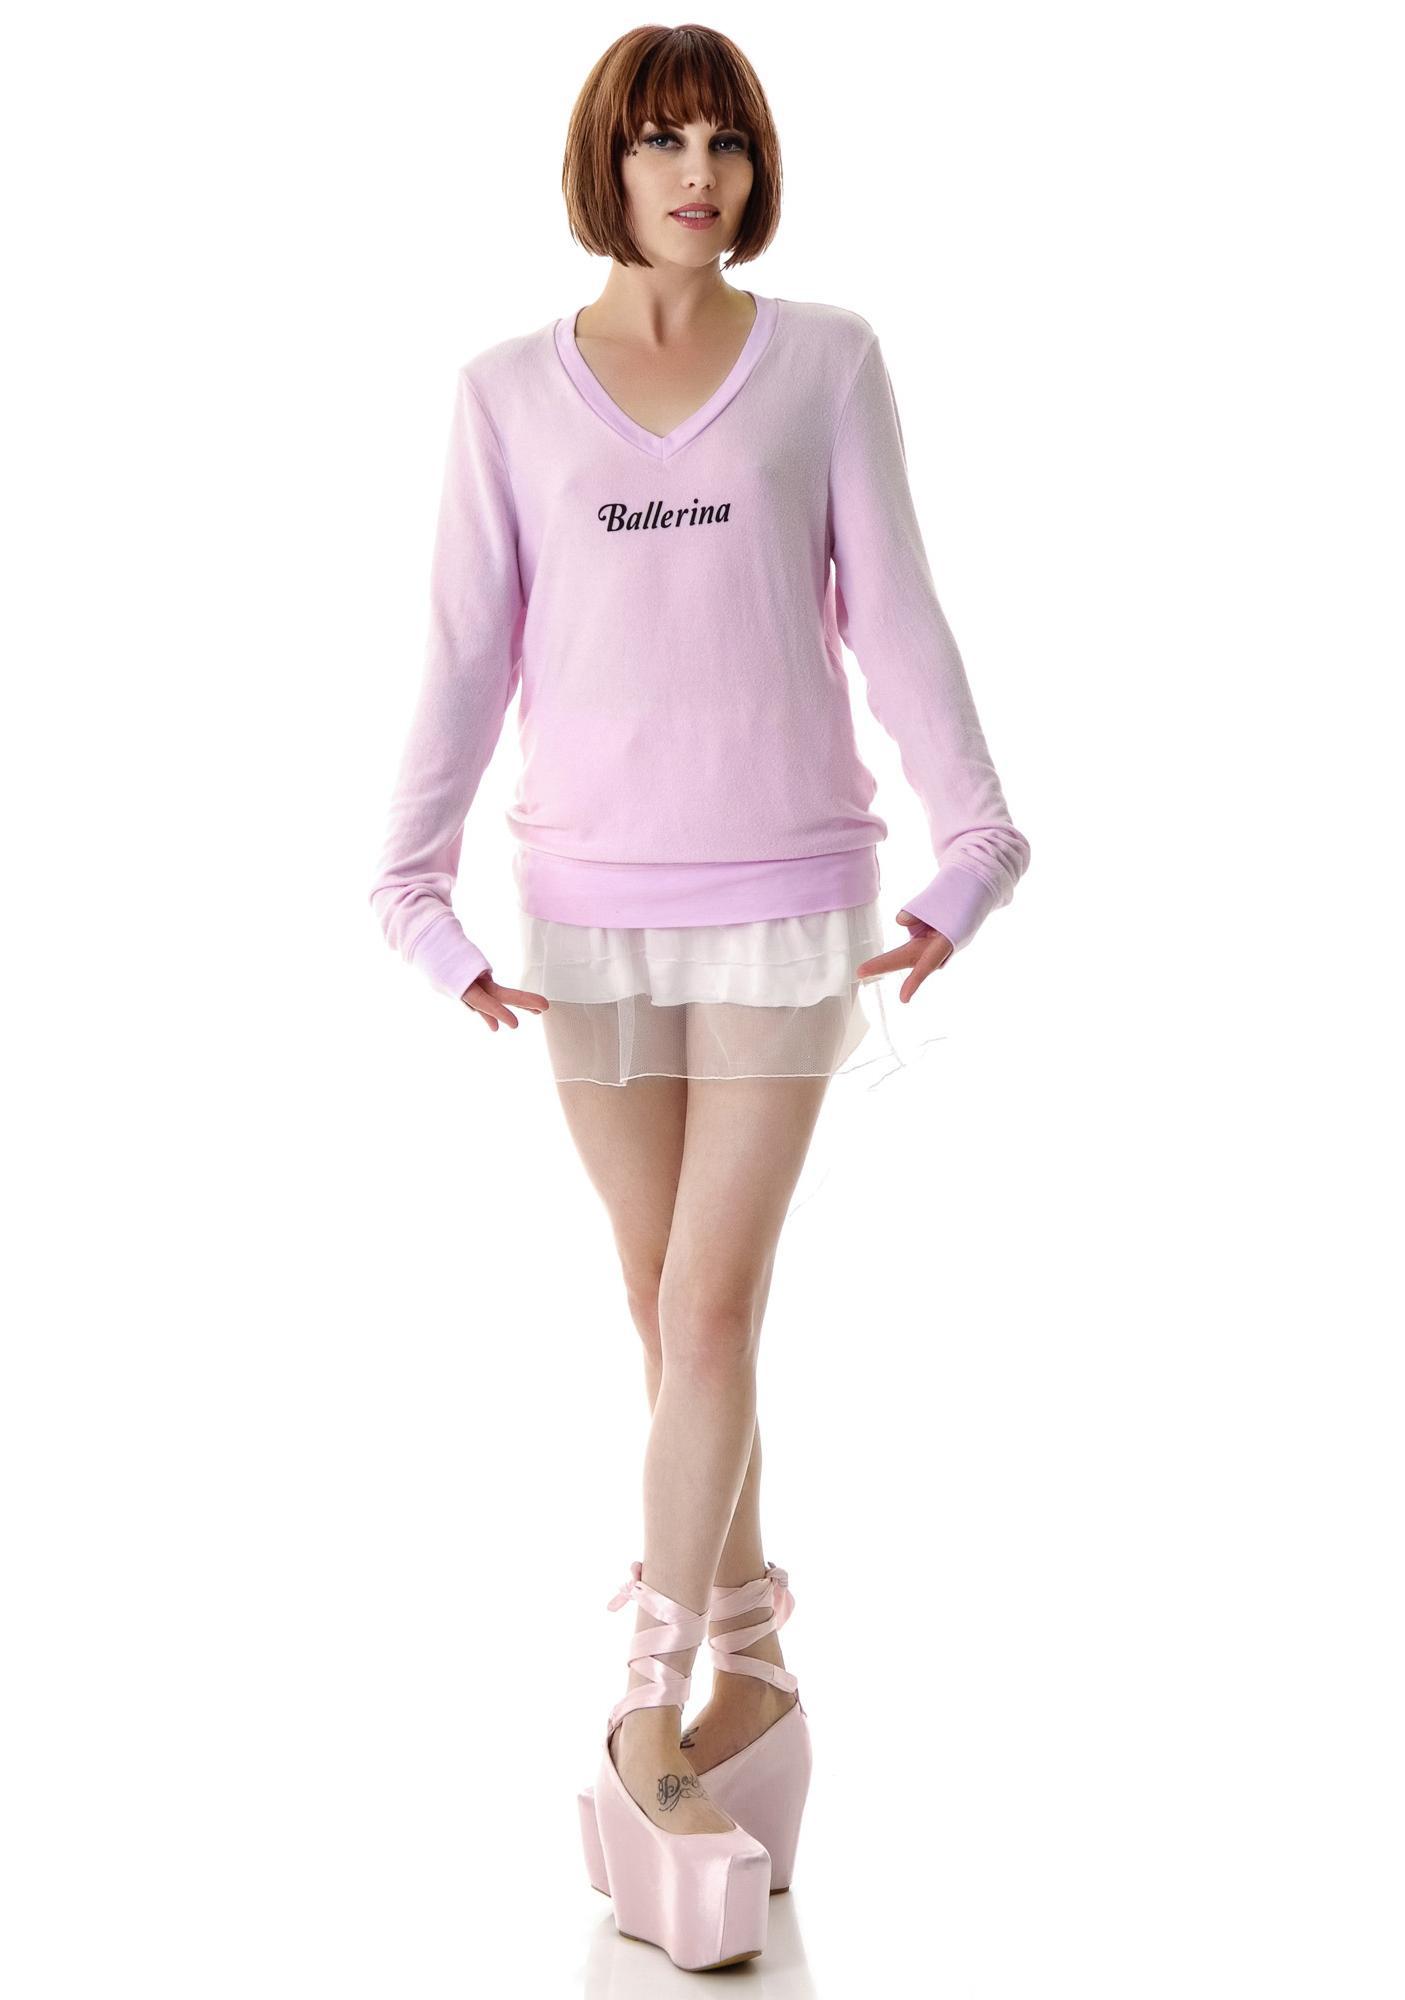 Wildfox Couture Ballerina Daisy V-Neck Baggy Beach Jumper